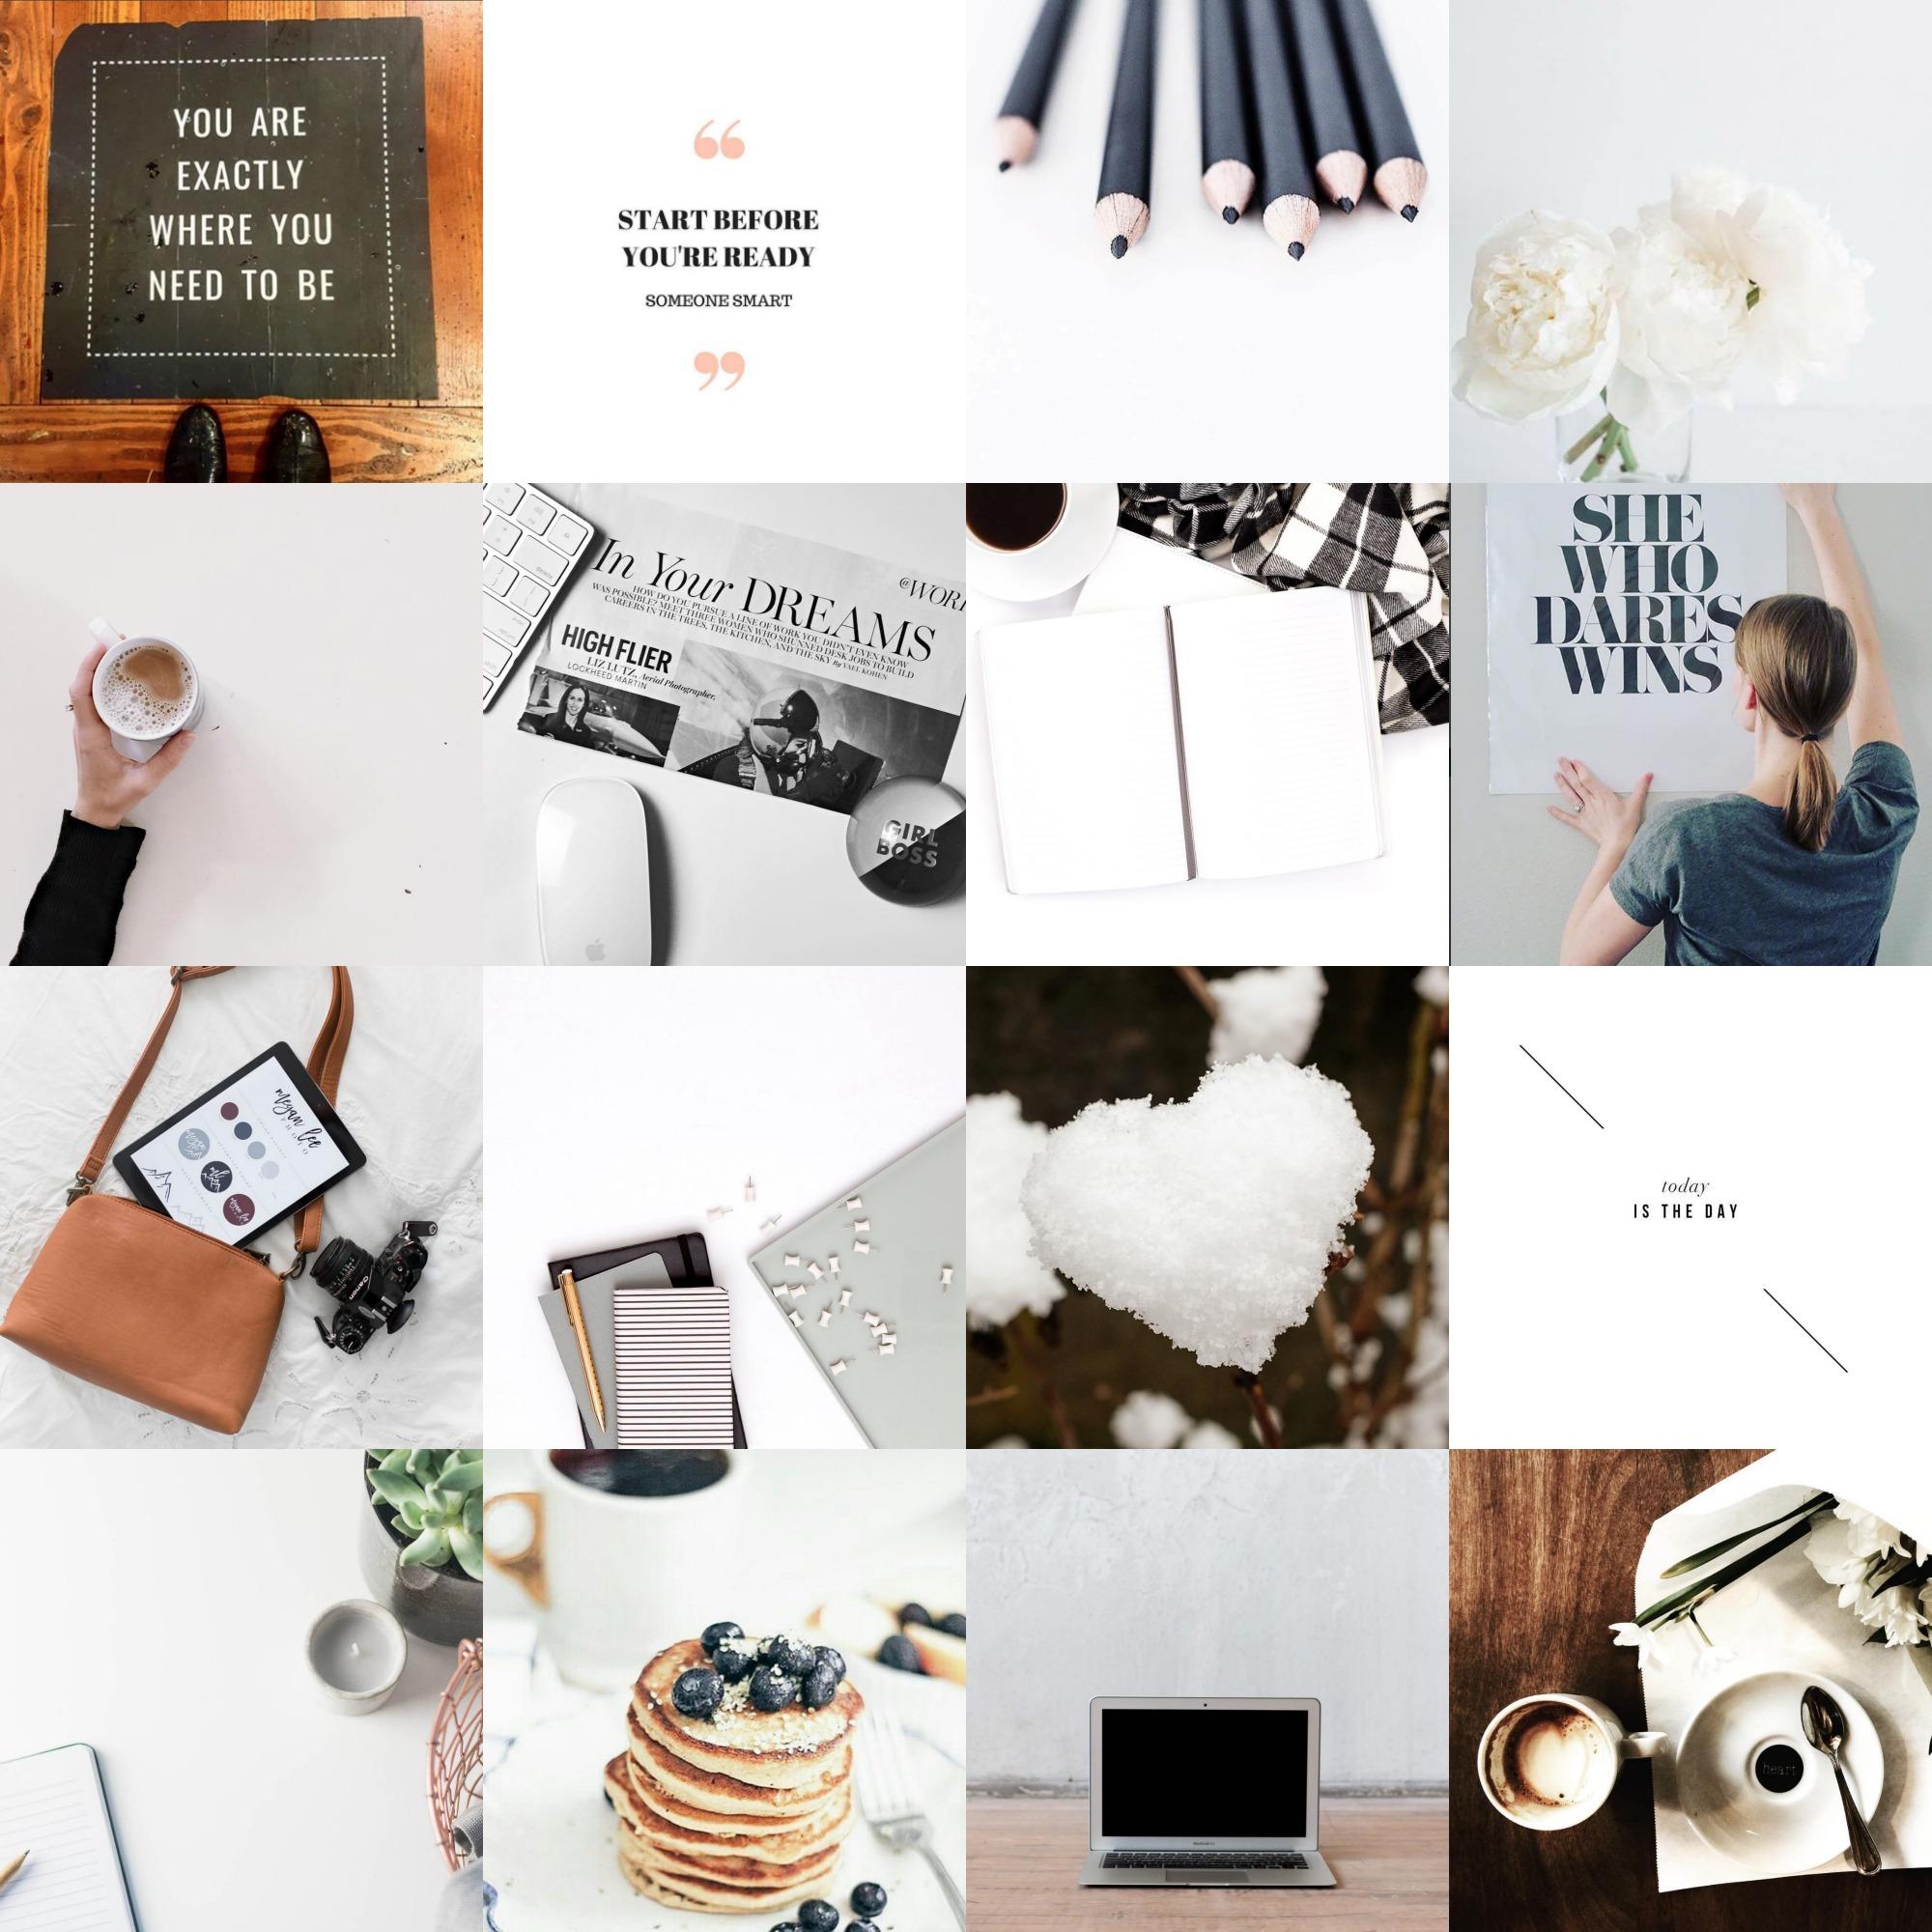 belong magazine - #youbelong instagram feed favorites